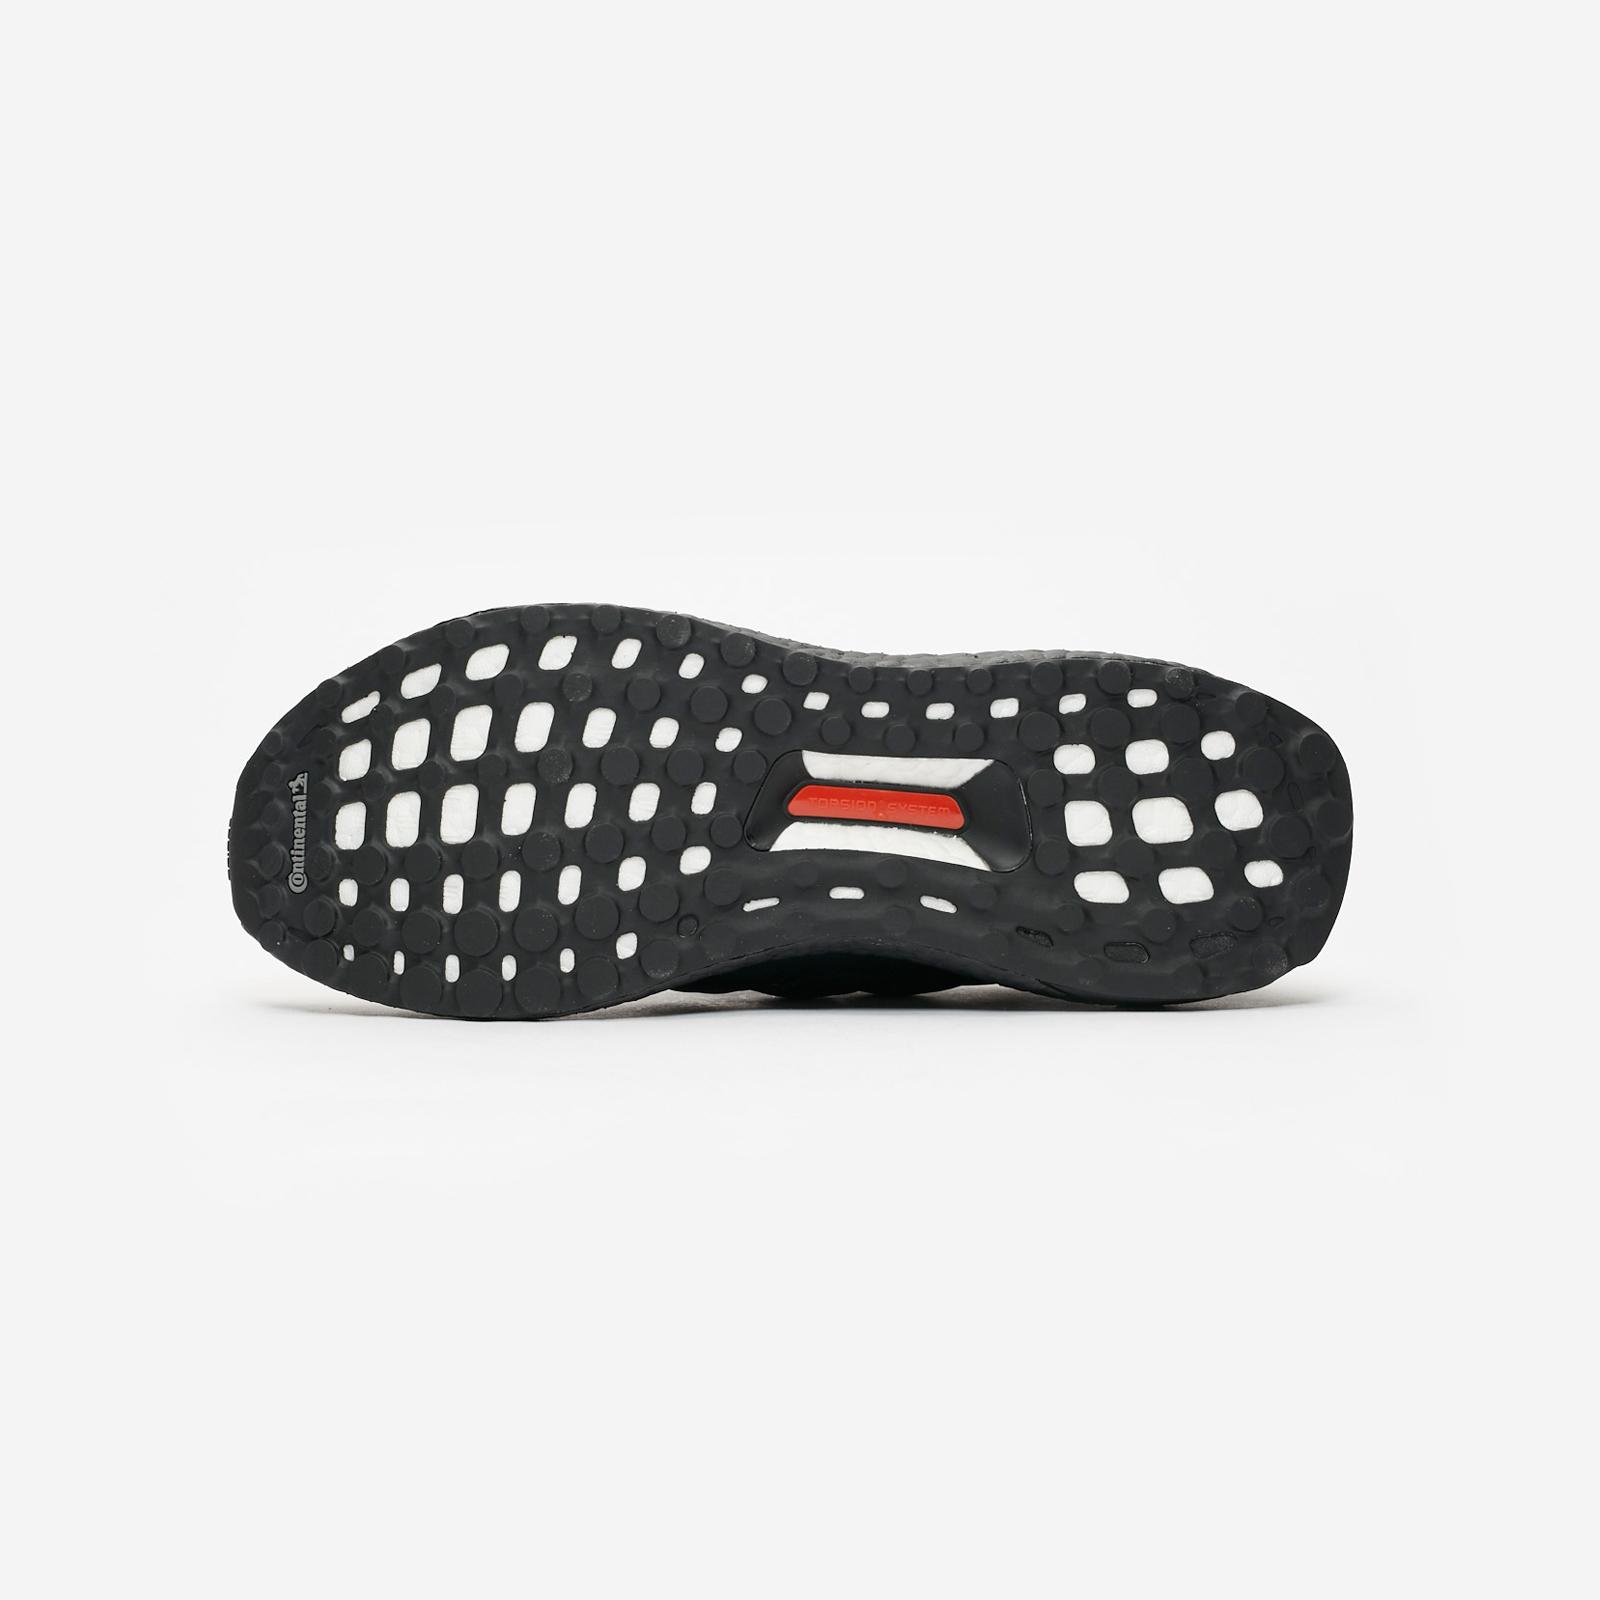 b32cae2956bcf adidas Ultraboost - F36641 - Sneakersnstuff